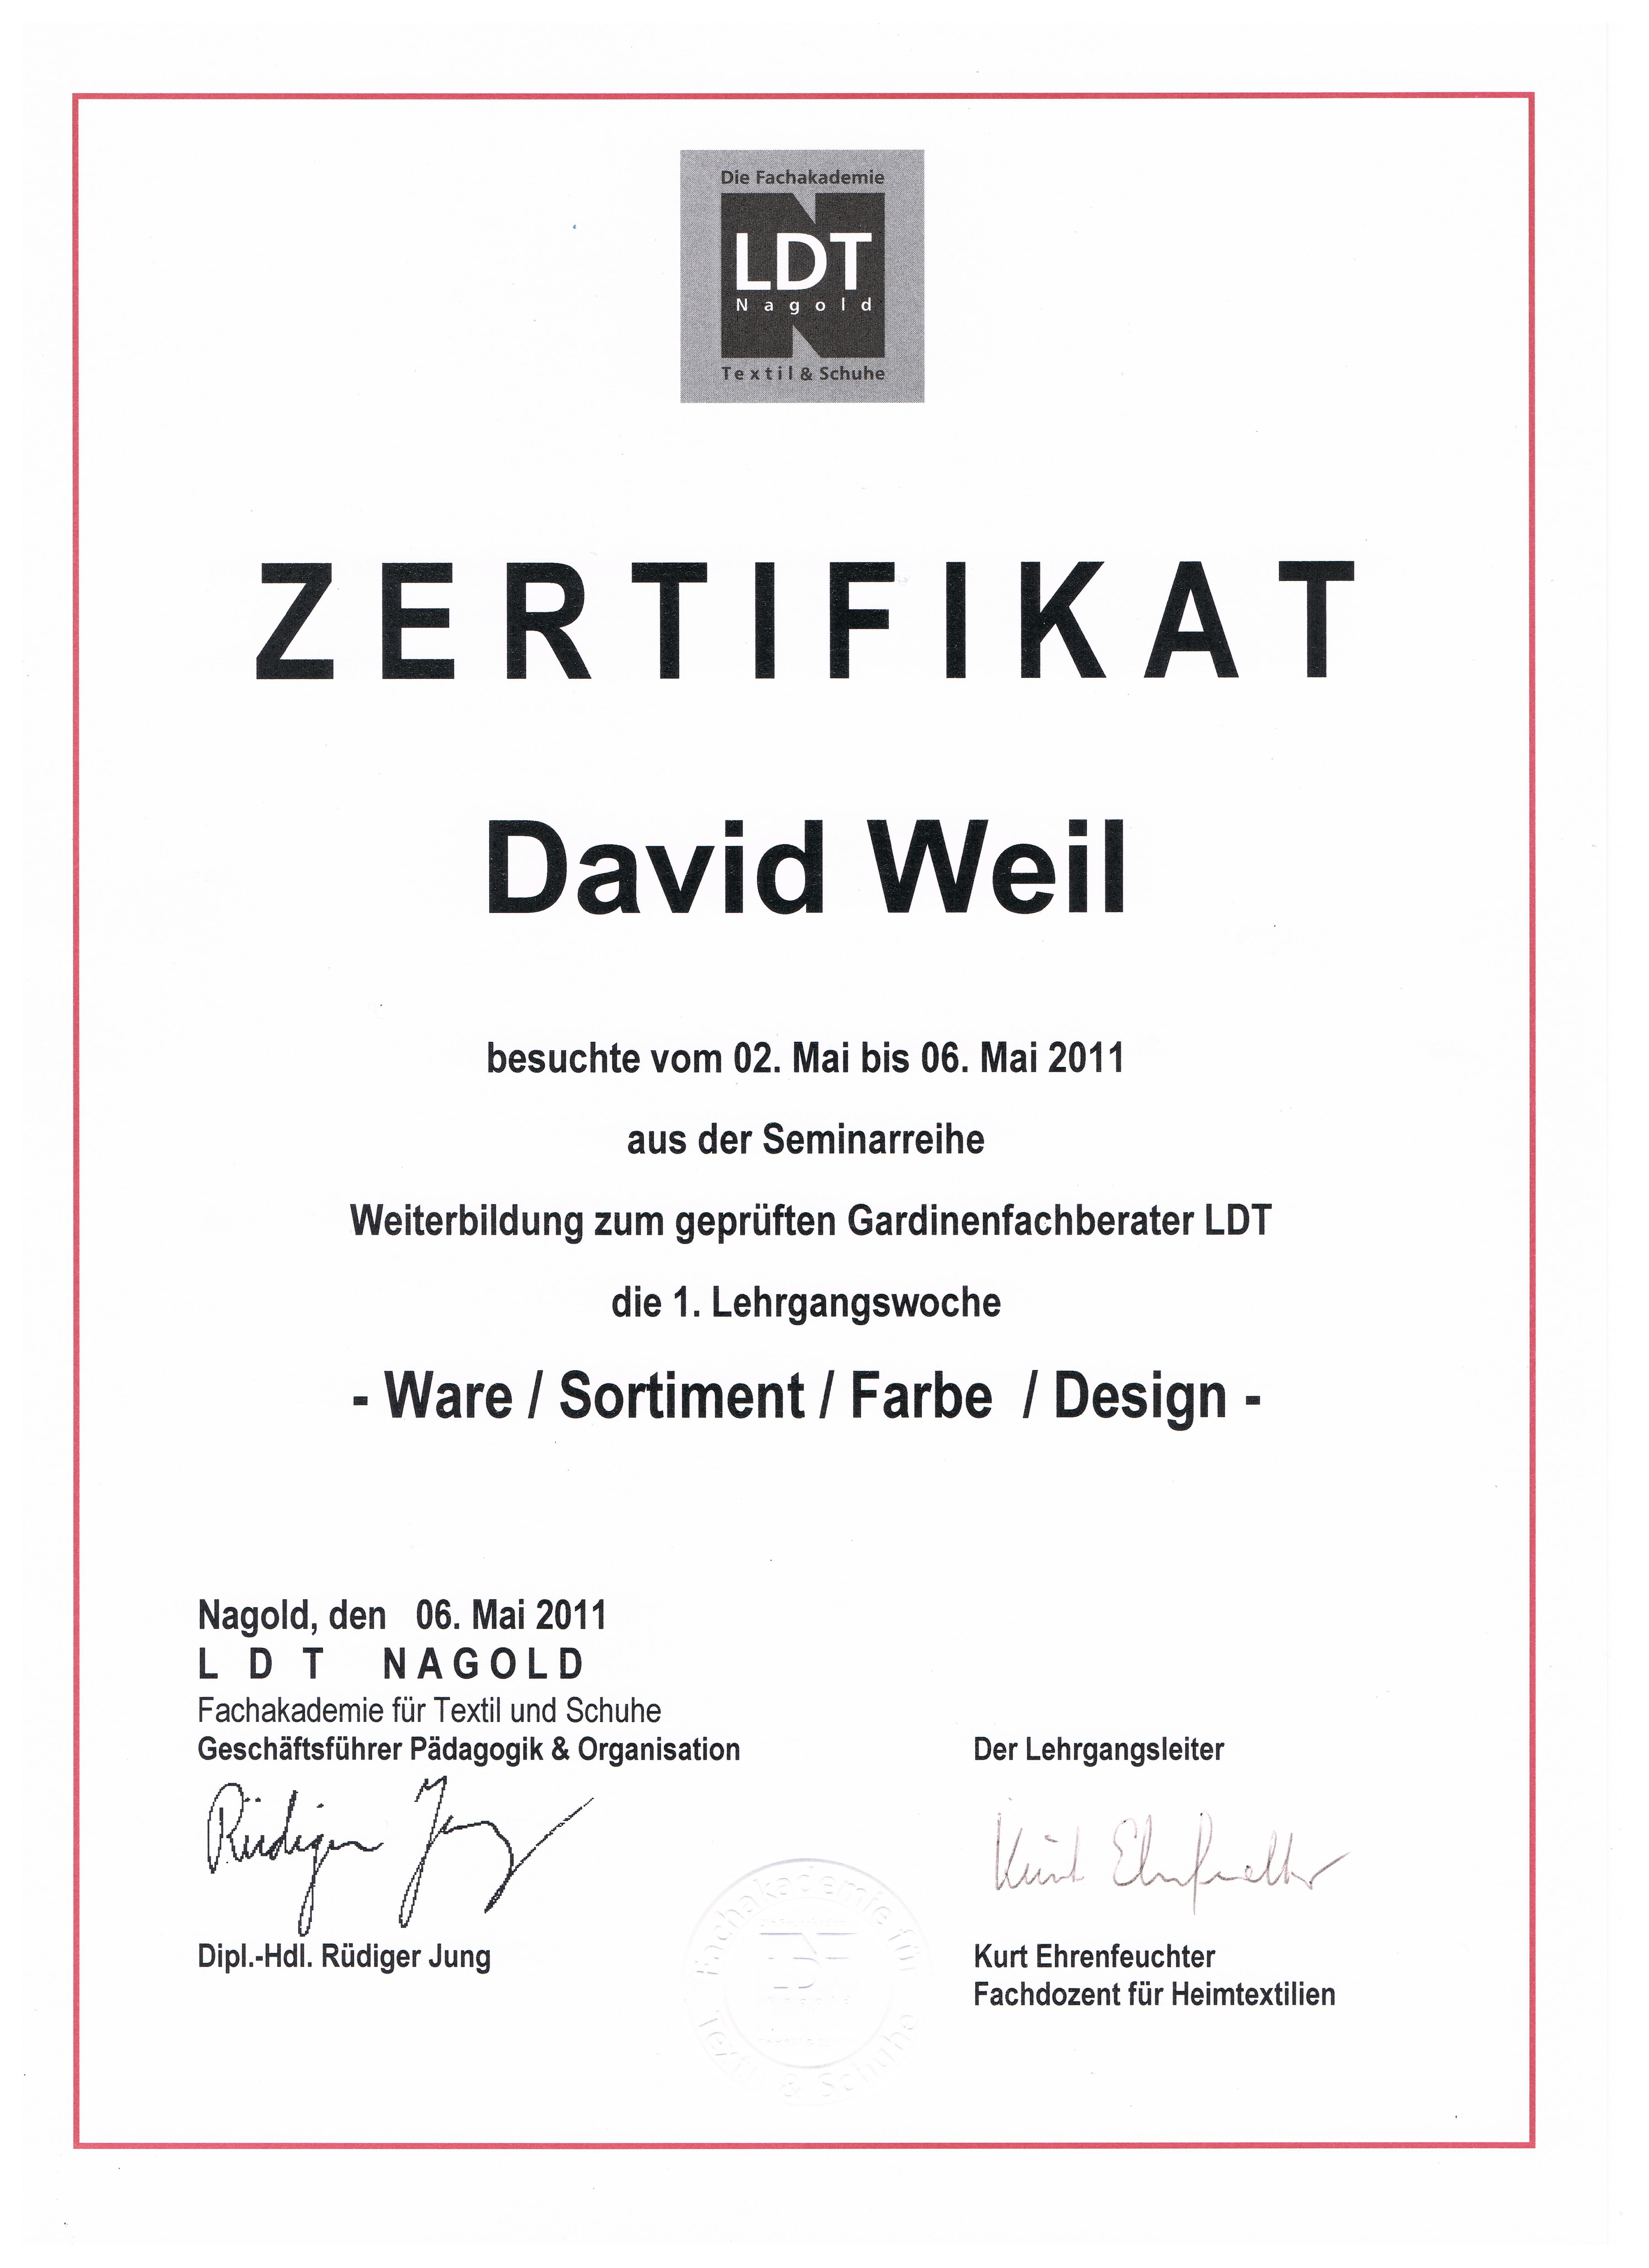 Zertifikat 1 001